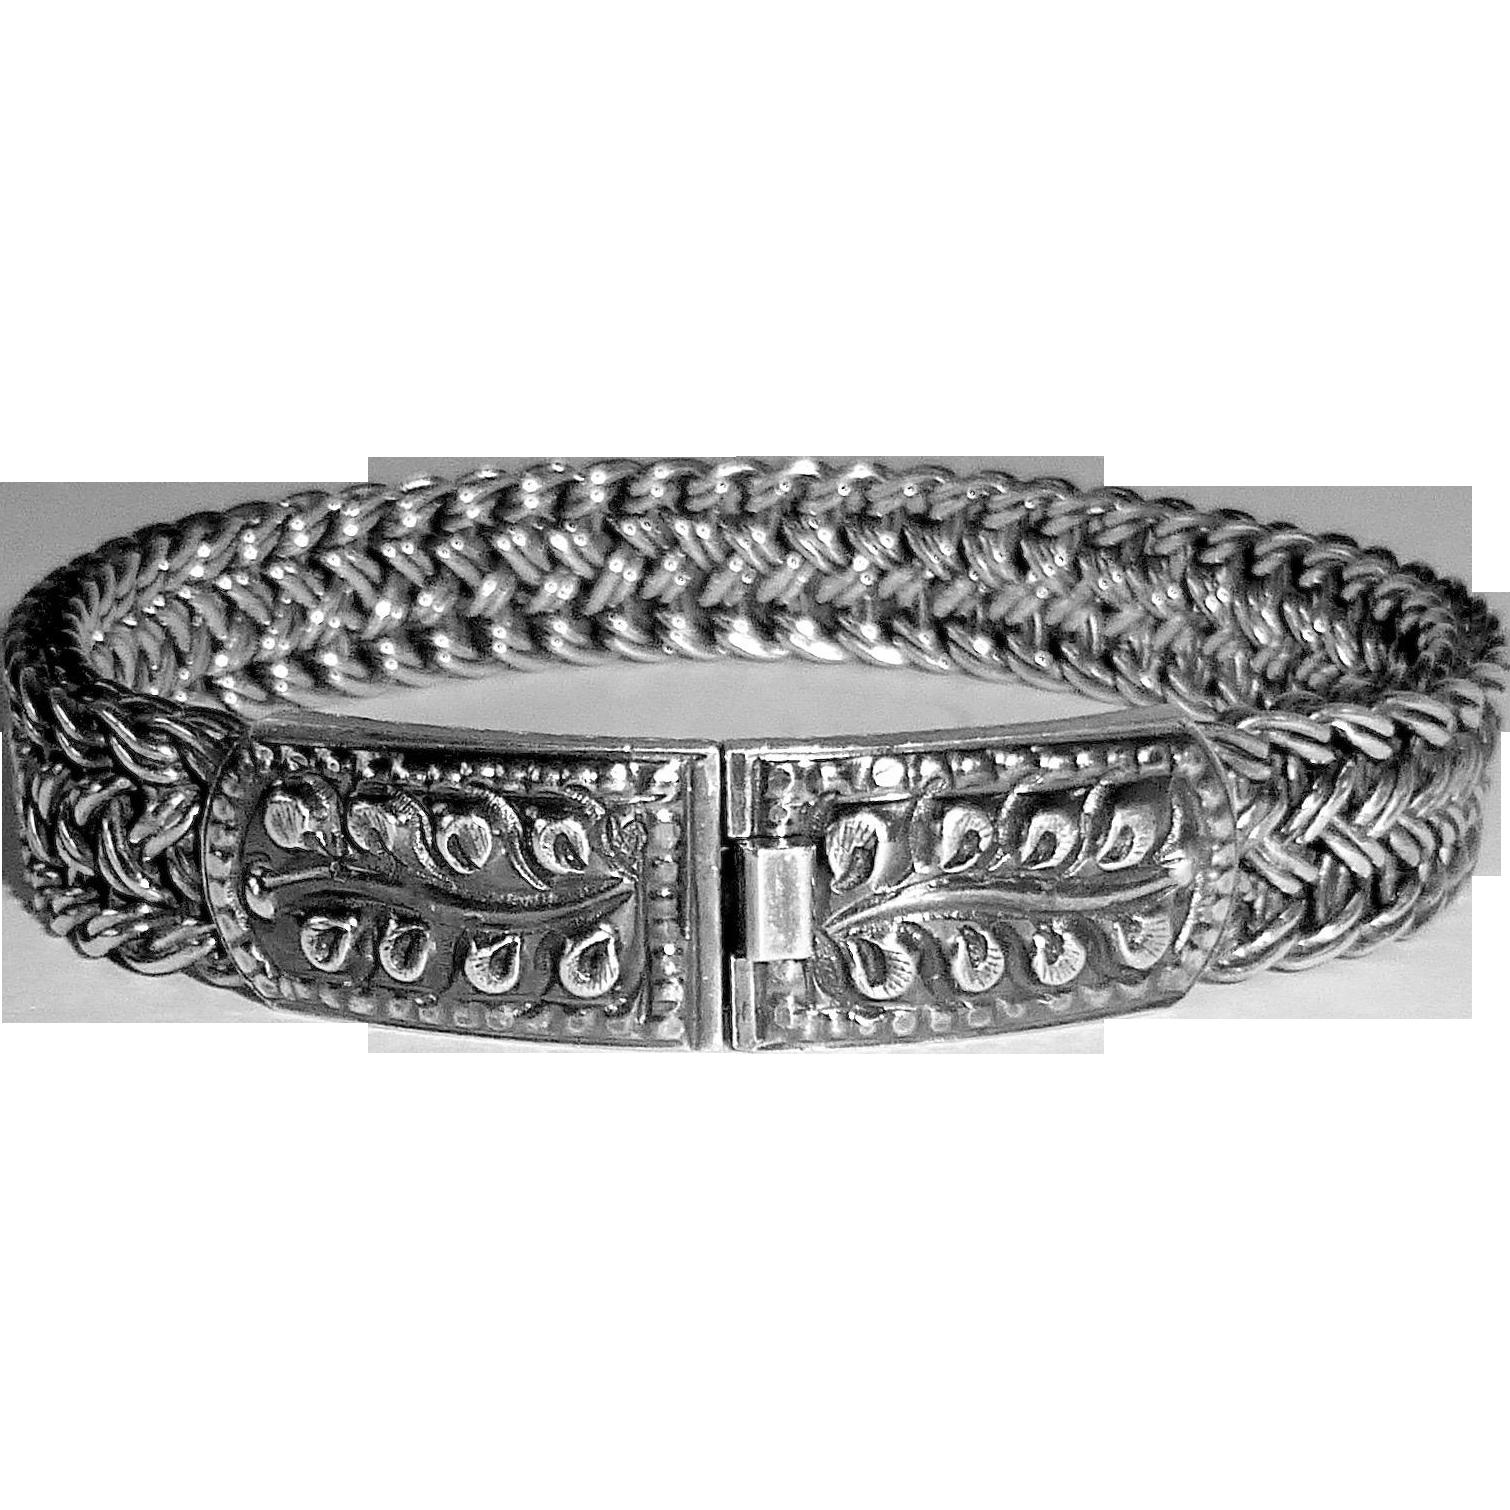 Heavy Woven Chain Bracelet w Decorative Box Clasp